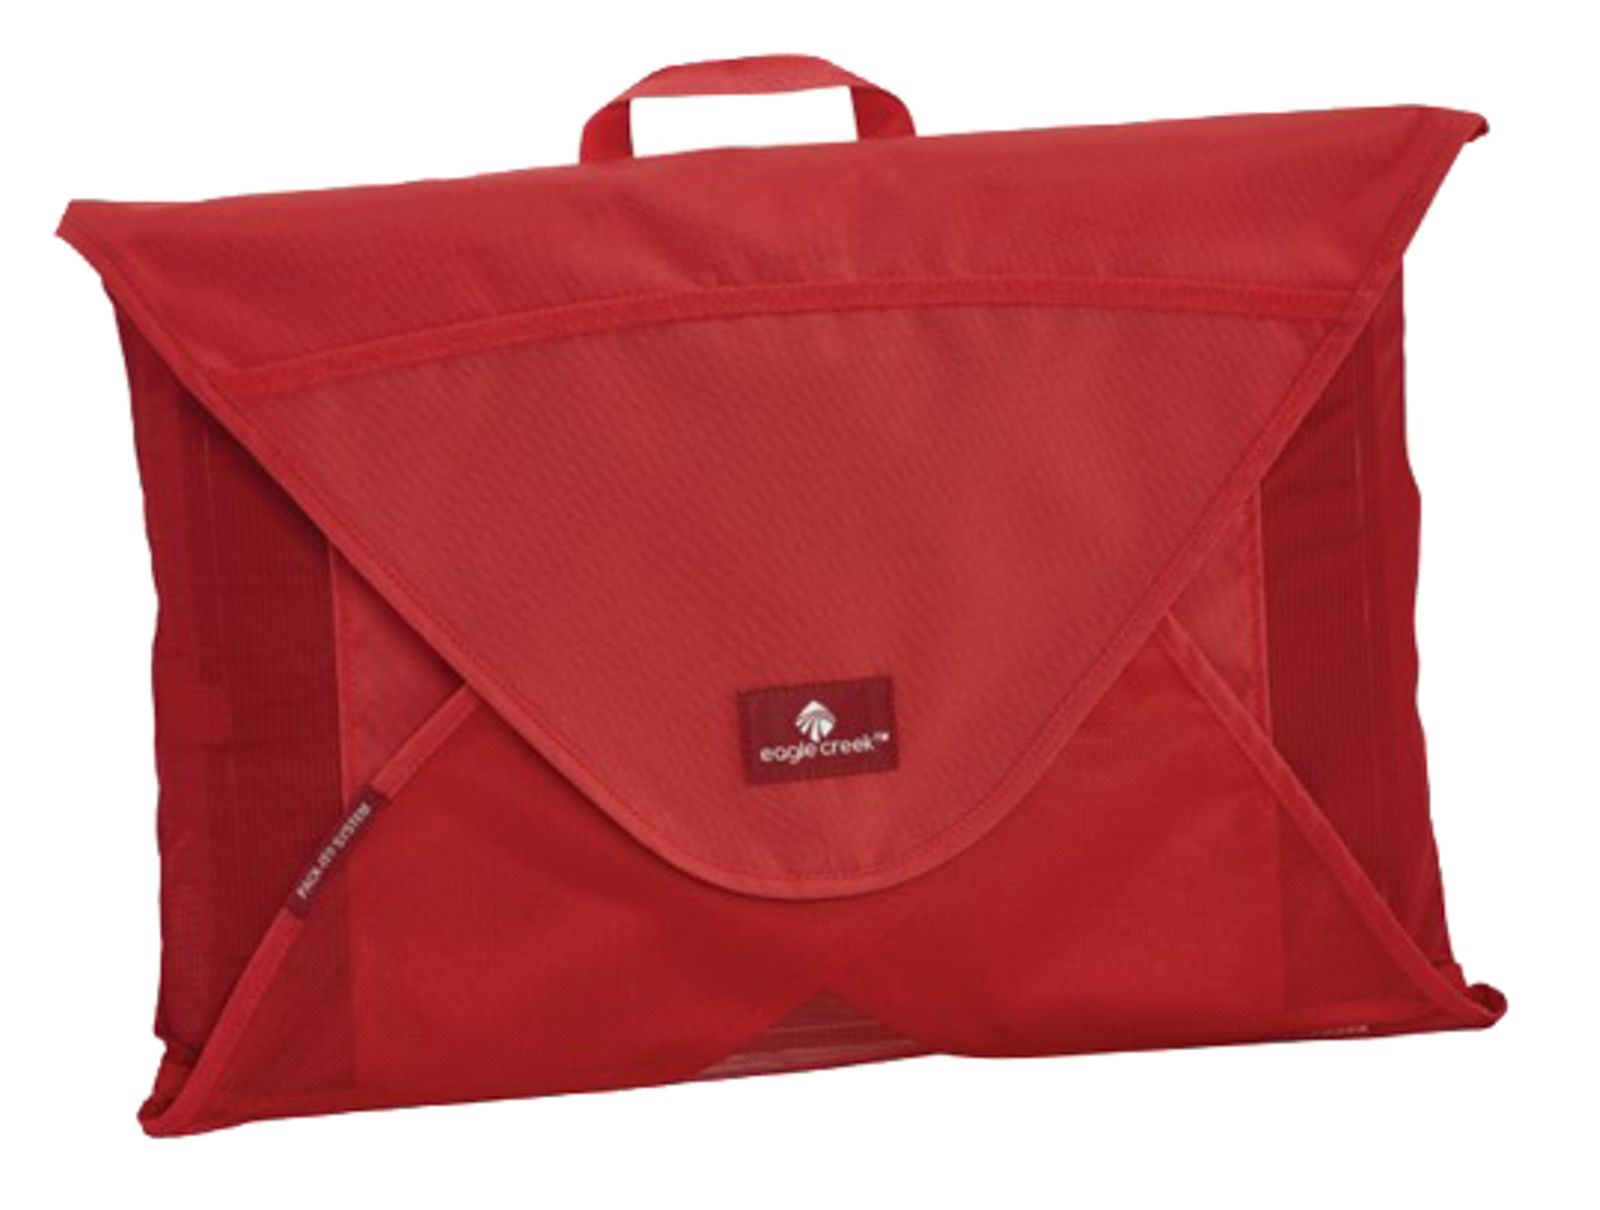 eagle creek Pack-It Garment Folder M Red Fire